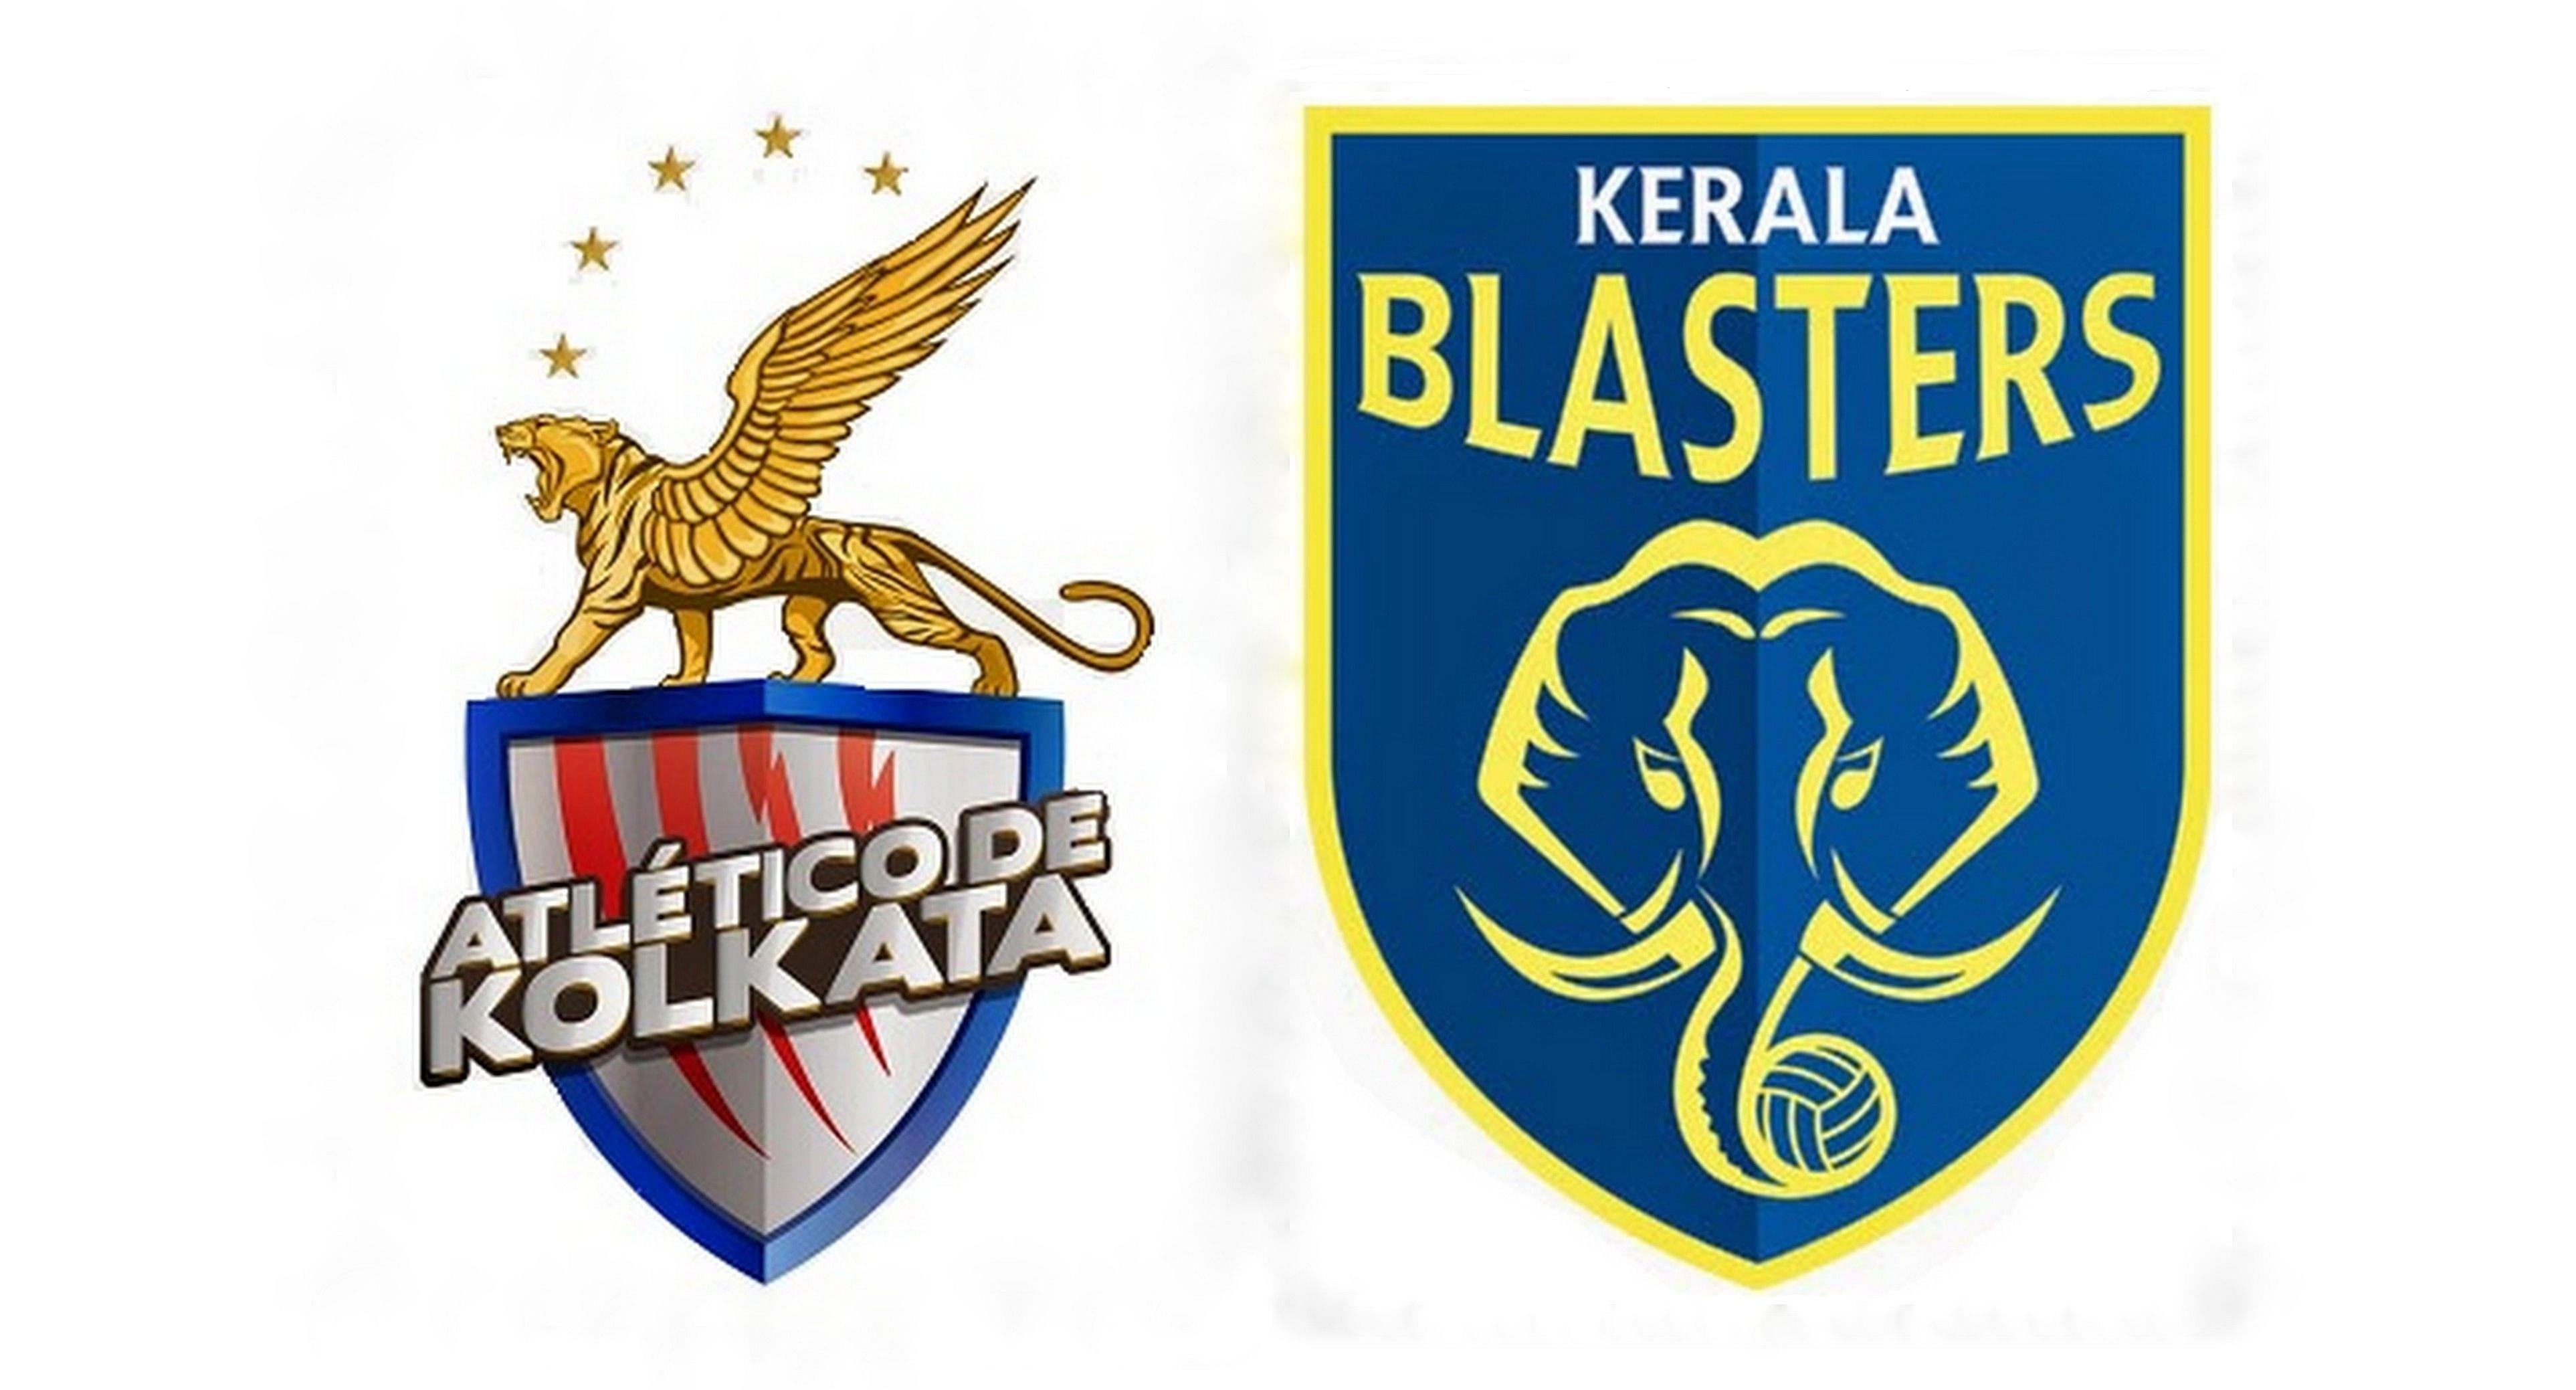 ISL: Atletico de Kolkata vs Kerala Blasters- What we can expect - Preview and Prediction